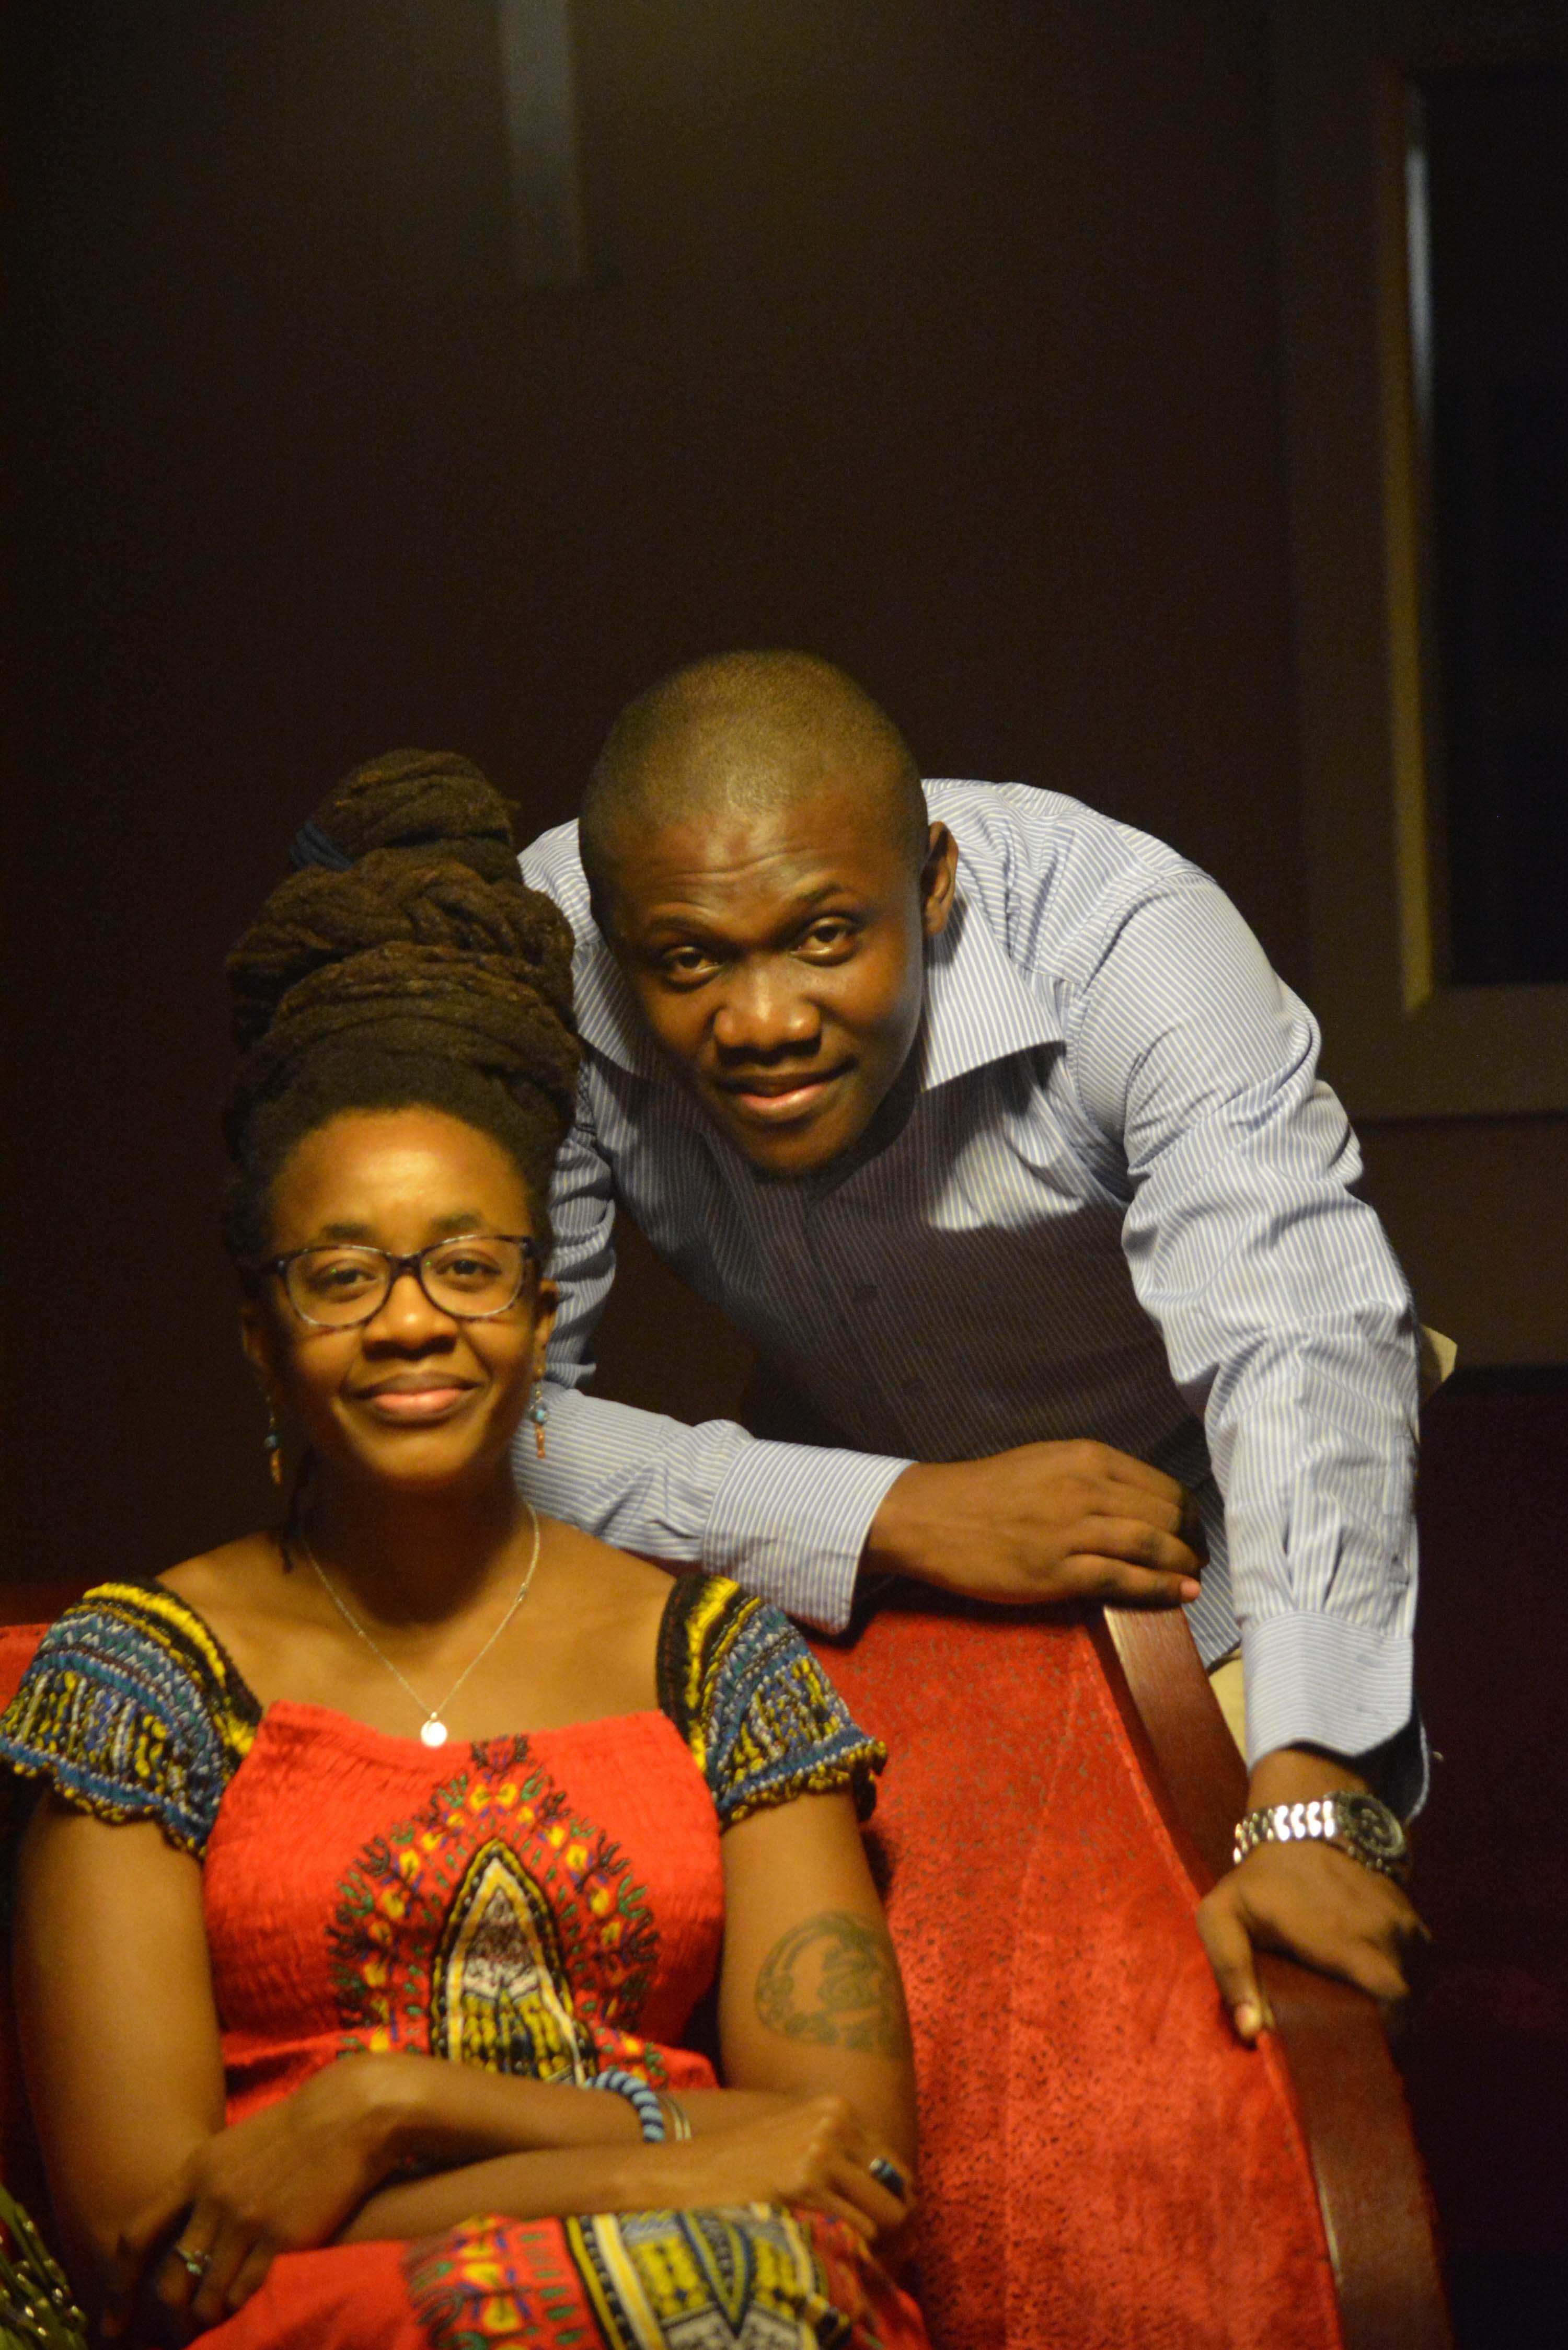 Nnedi Okorafor with C.J. Obasi